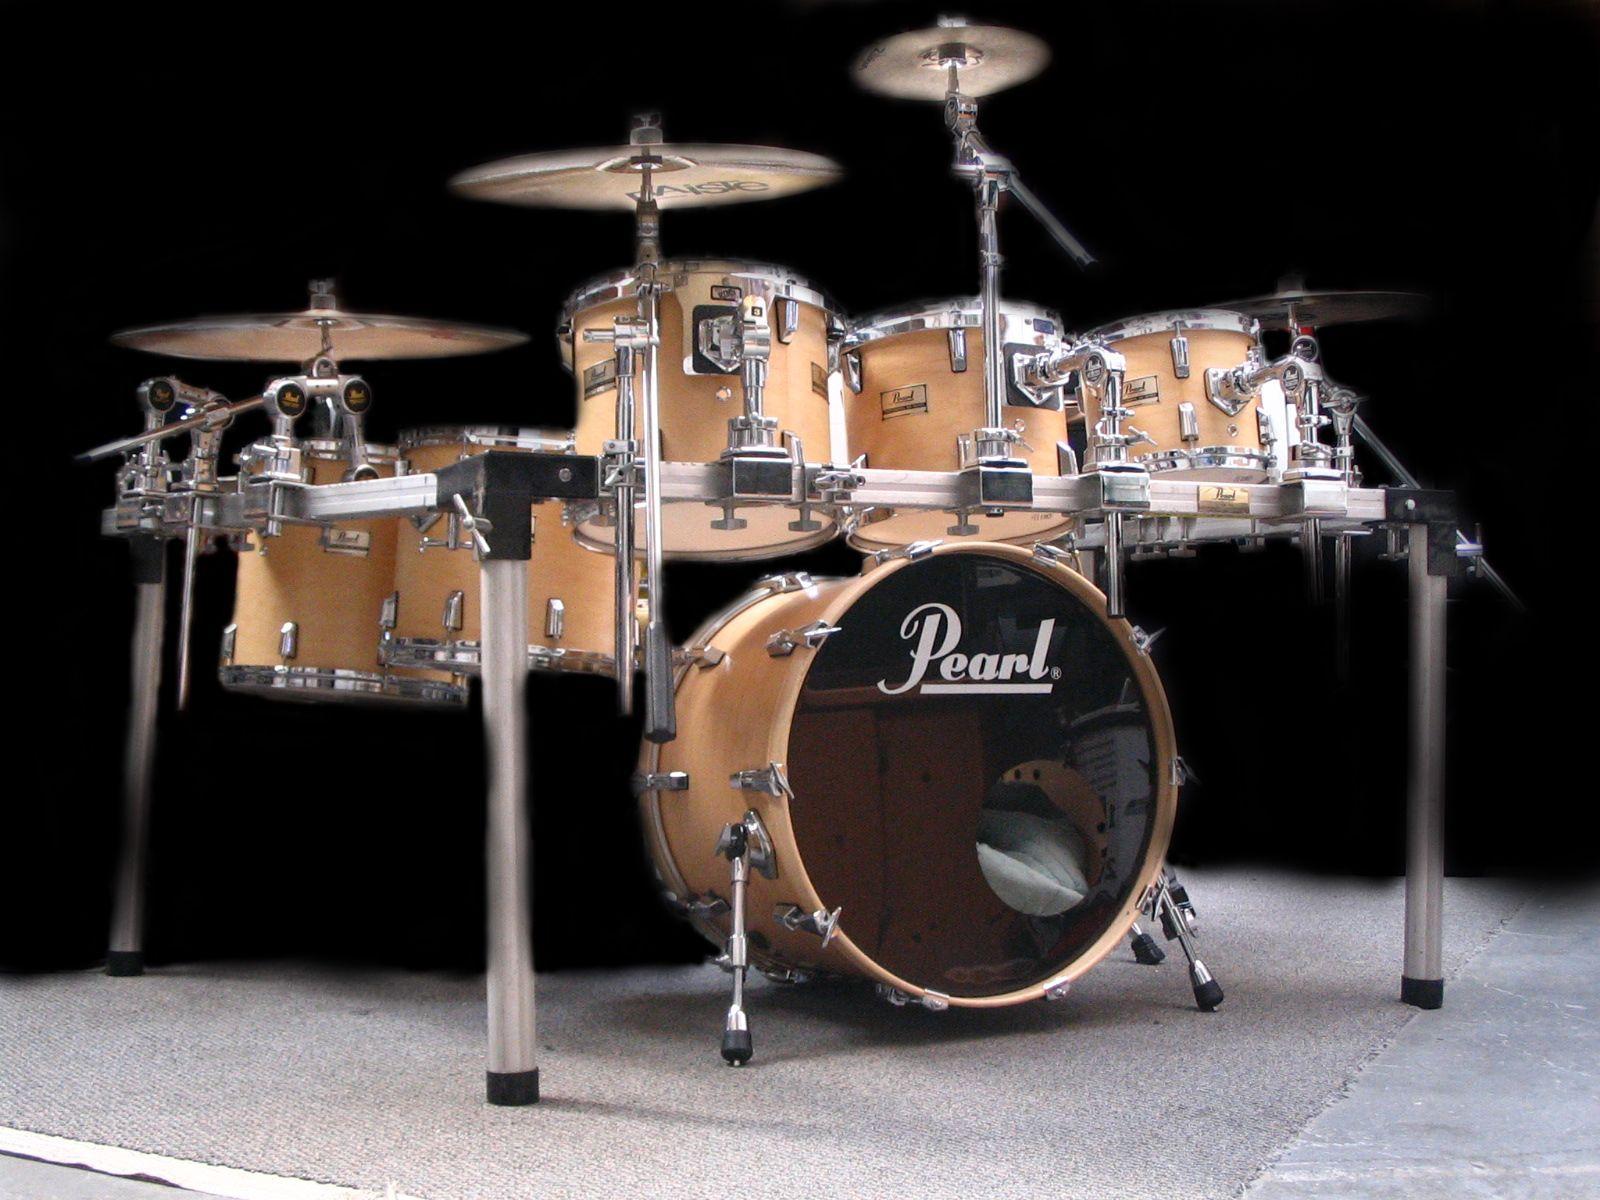 drum set hd wallpapers wallpaper cave